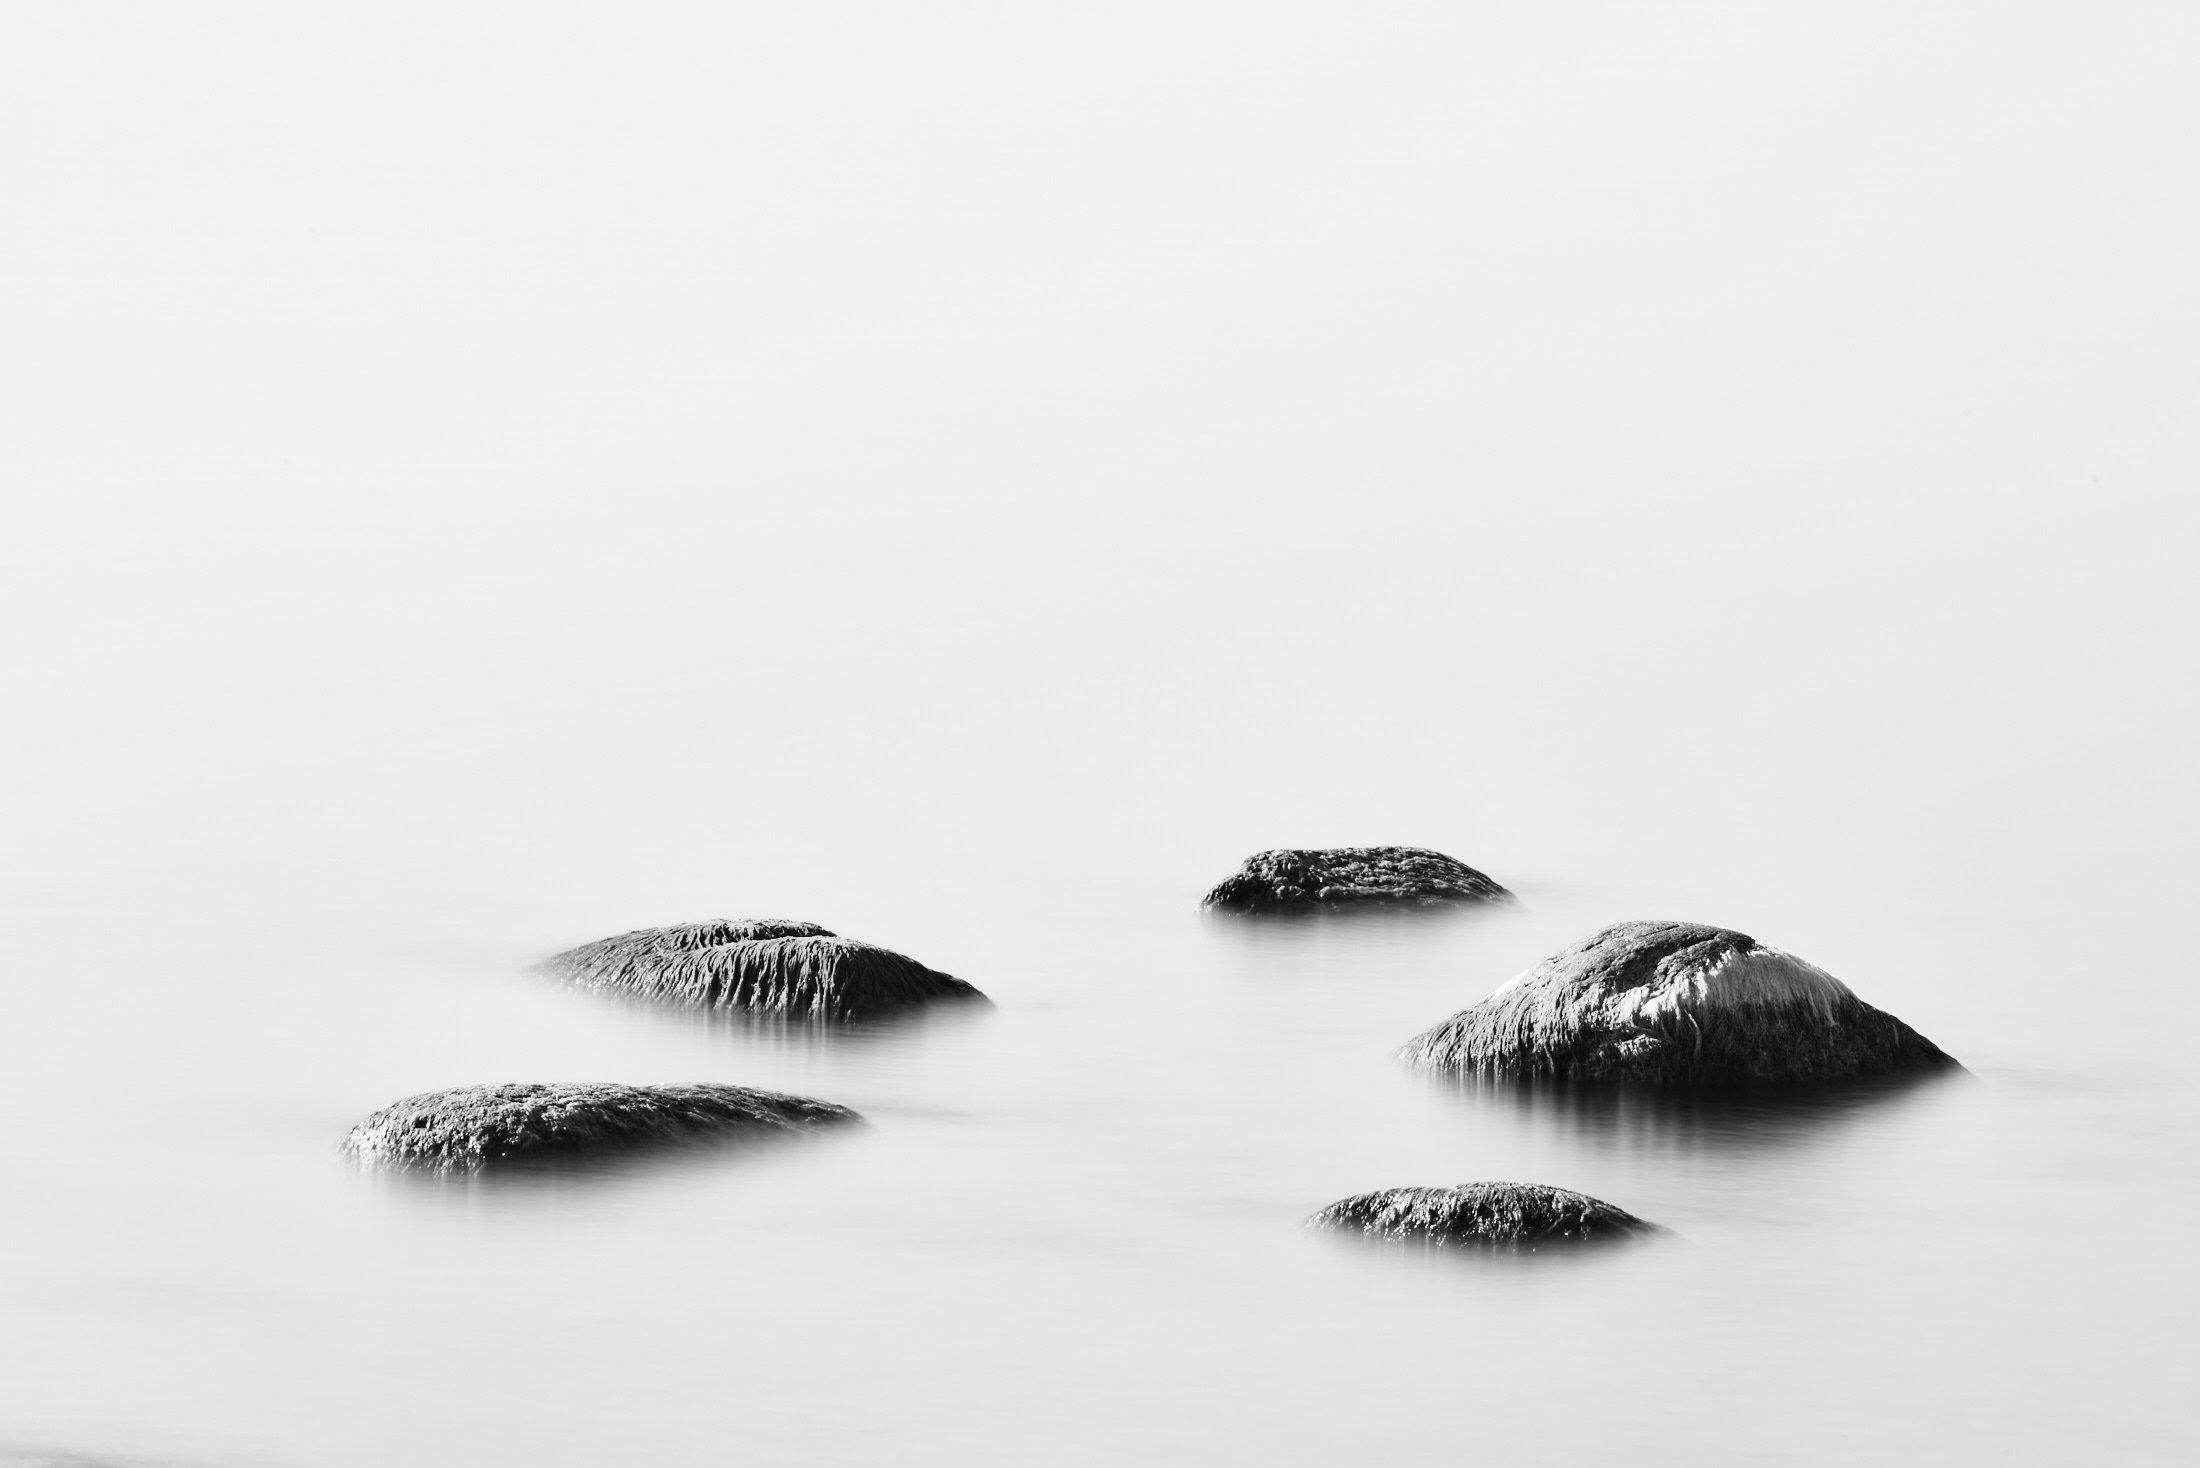 Mountains of the Sea IX, 2016